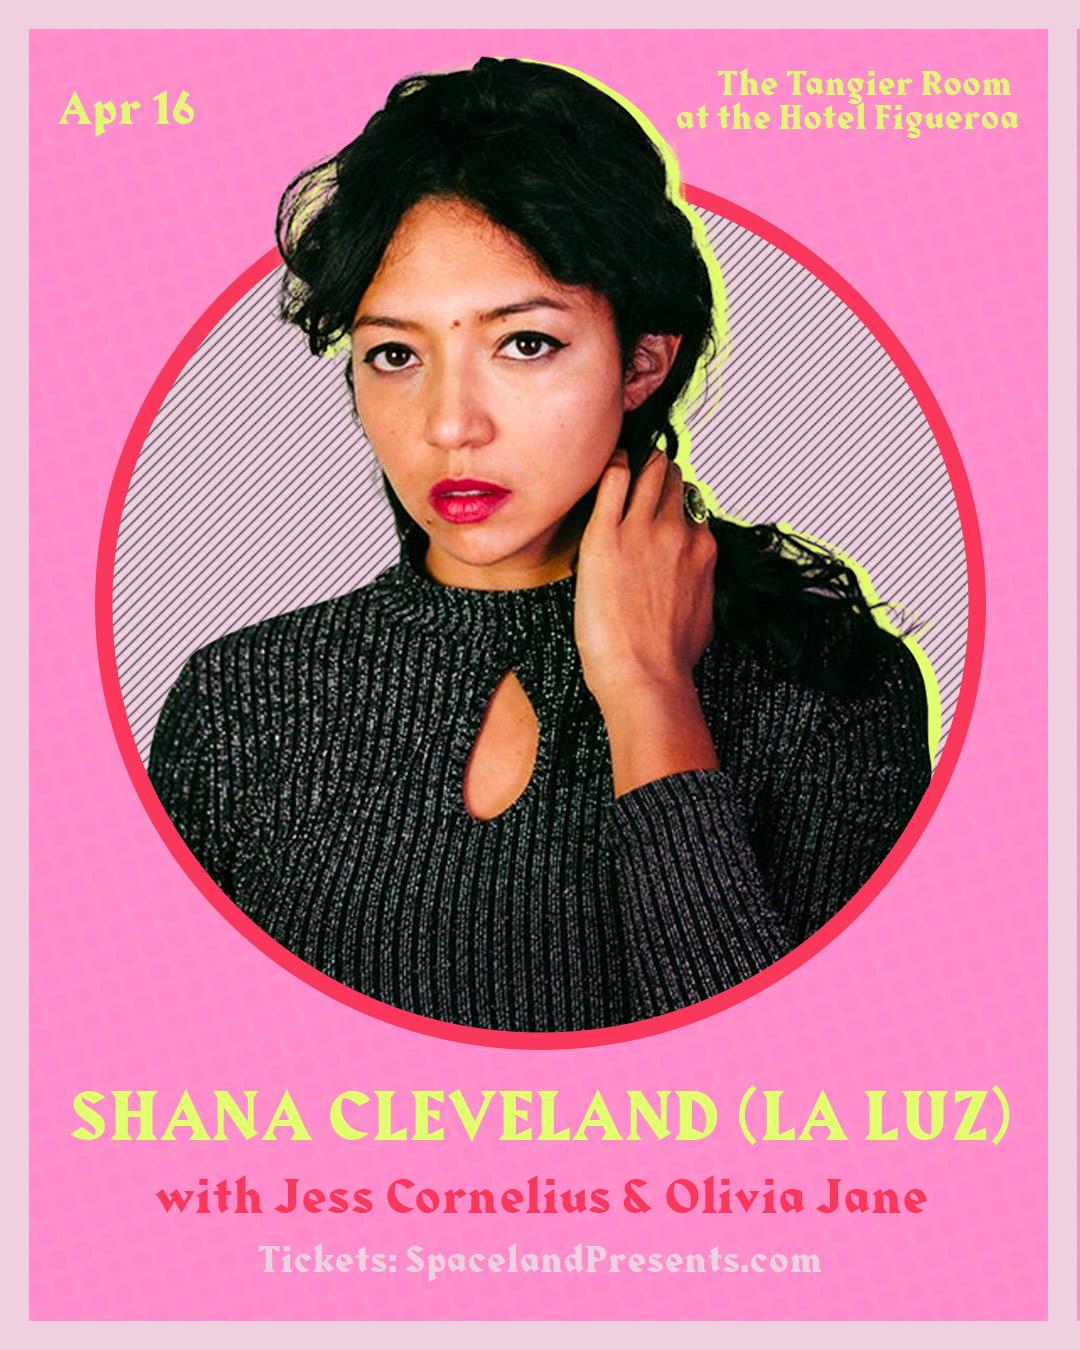 Shana Cleveland at Hotel Figueroa